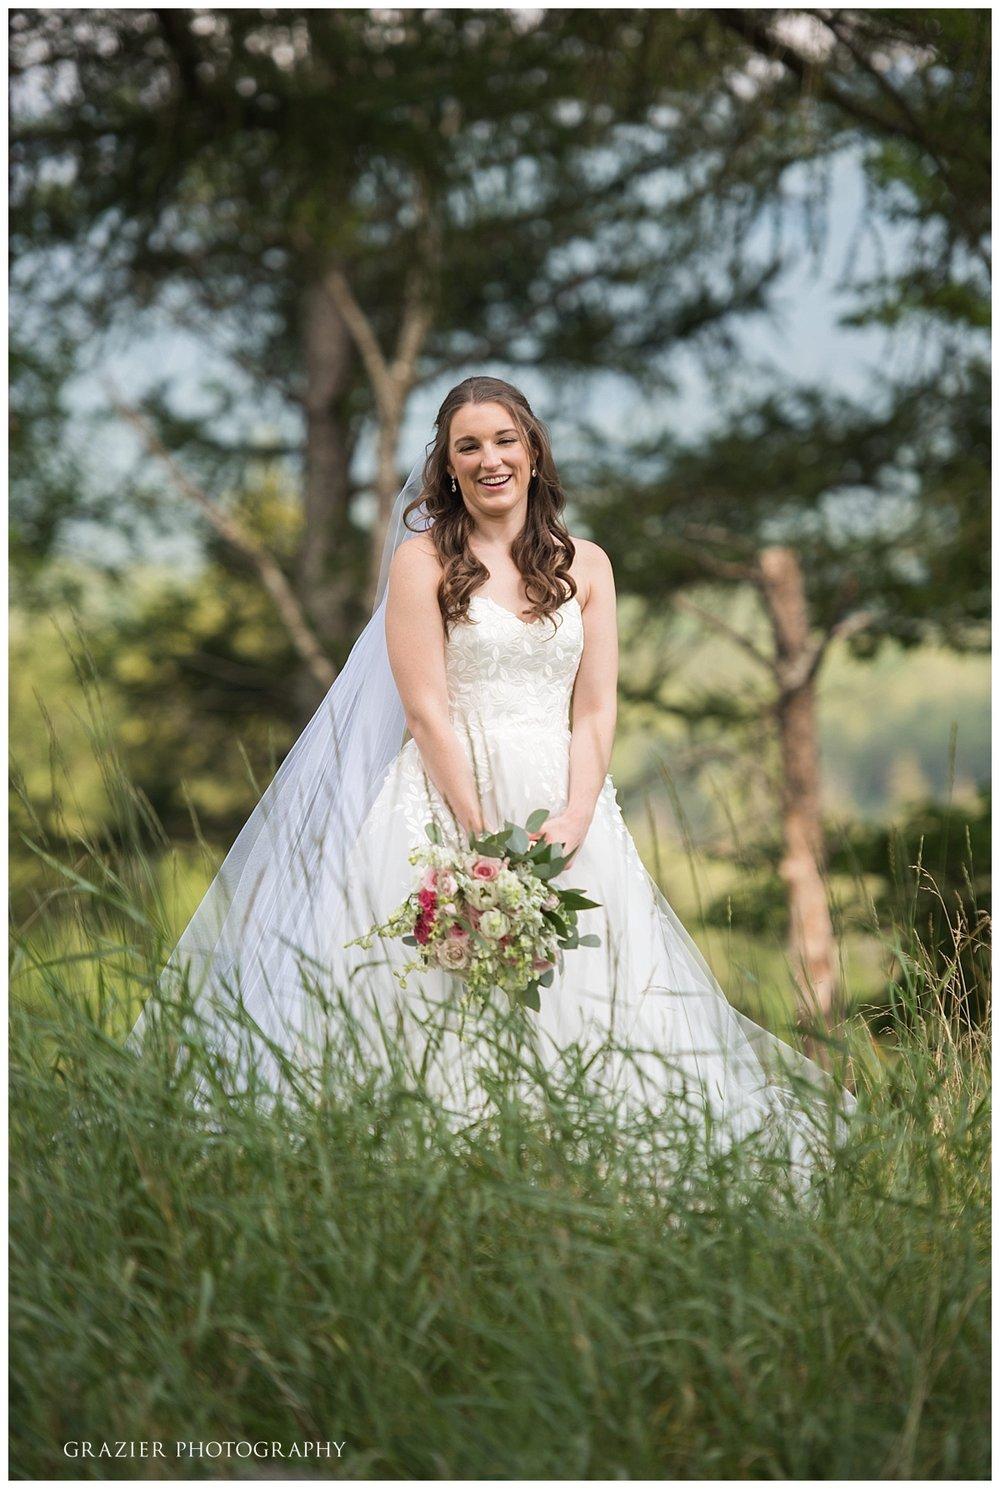 Mount Washington Hotel Wedding Grazier Photography 171125-424_WEB.jpg